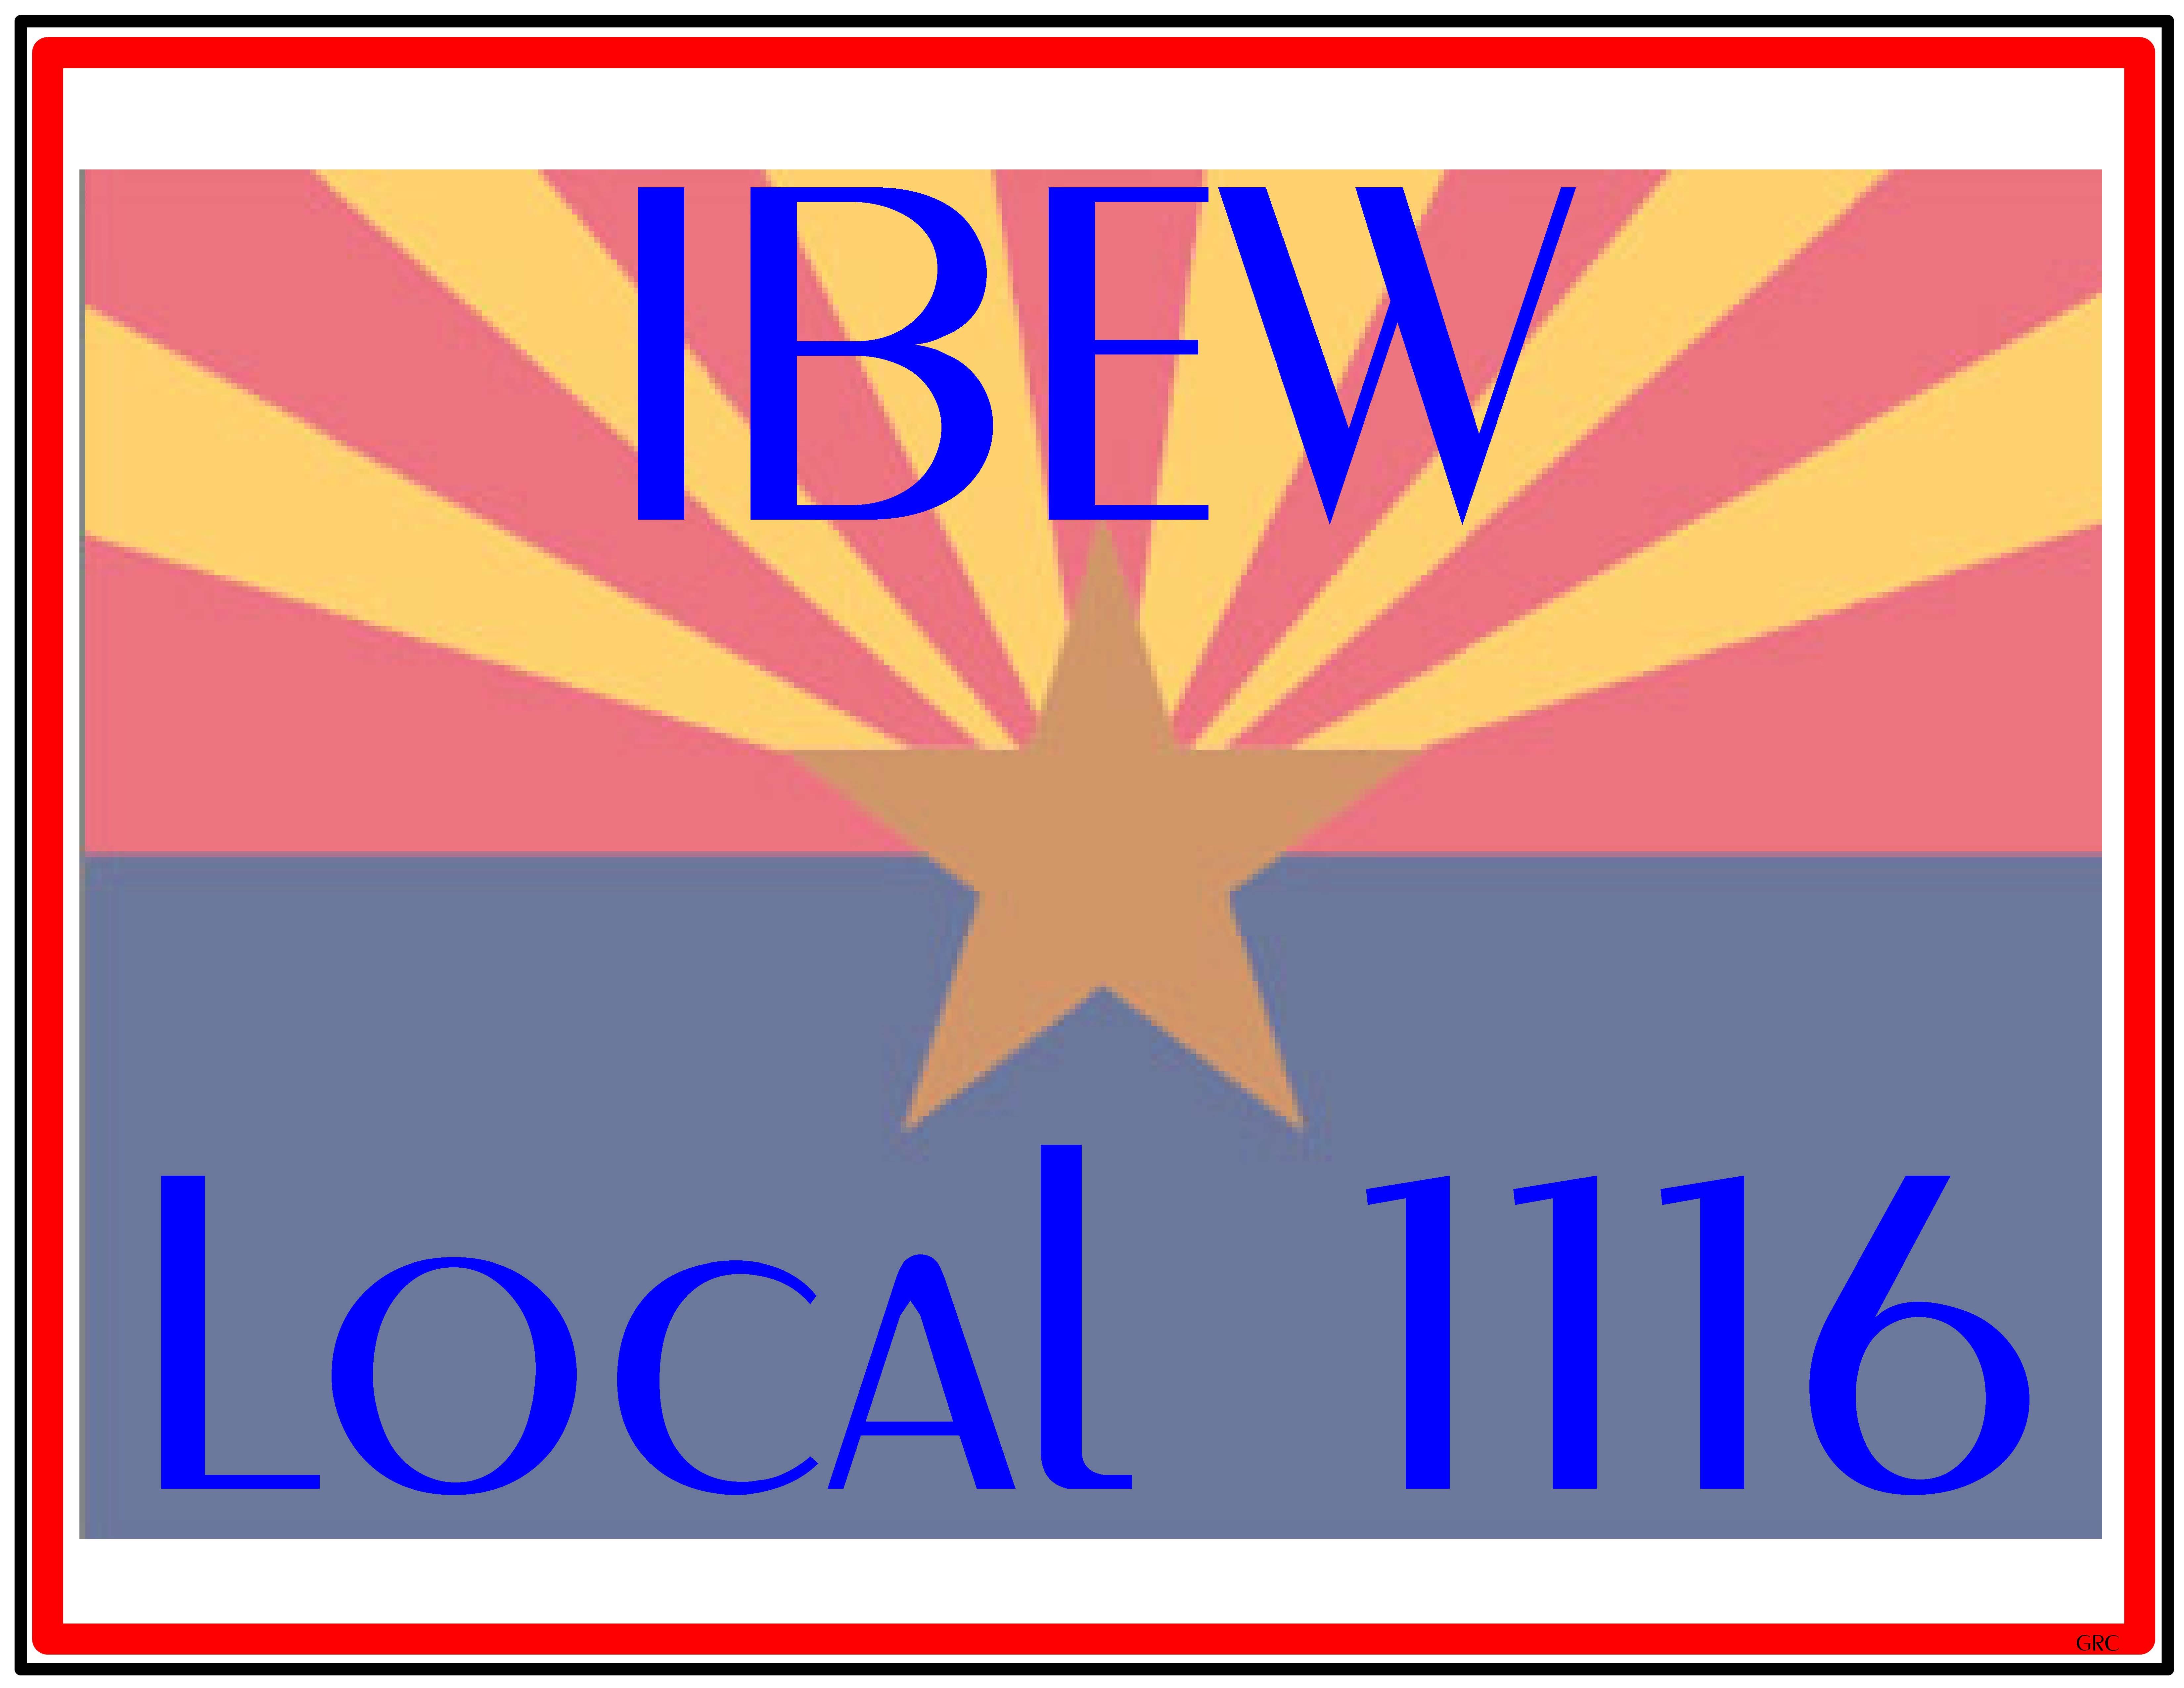 IBEW 1116